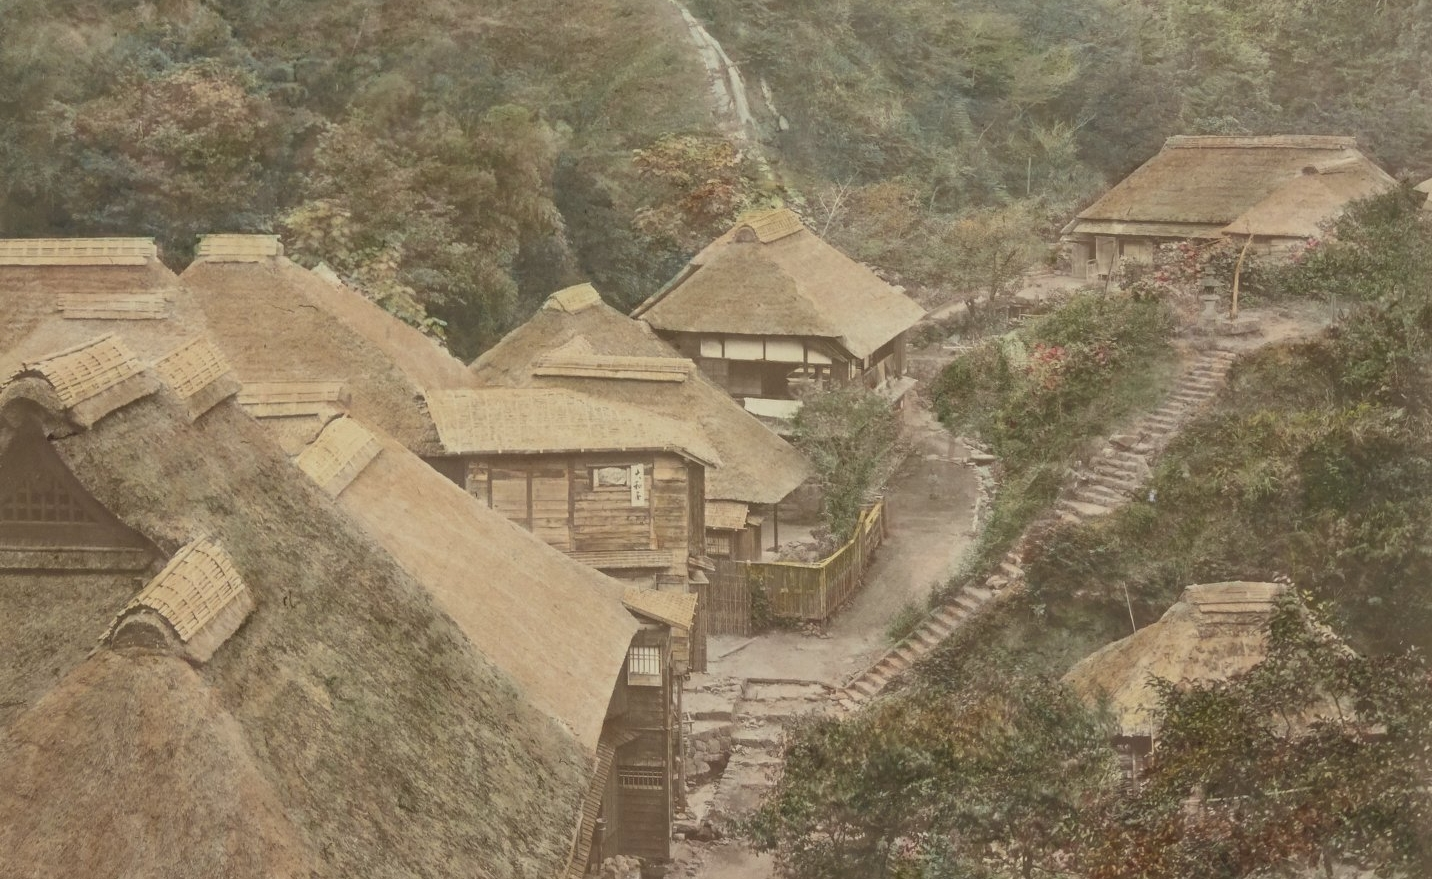 [Hakone] Dogashima, [s.d.], Japonais / Stillfried & Andersen, 1877-1878. SG WD-232 (RES)